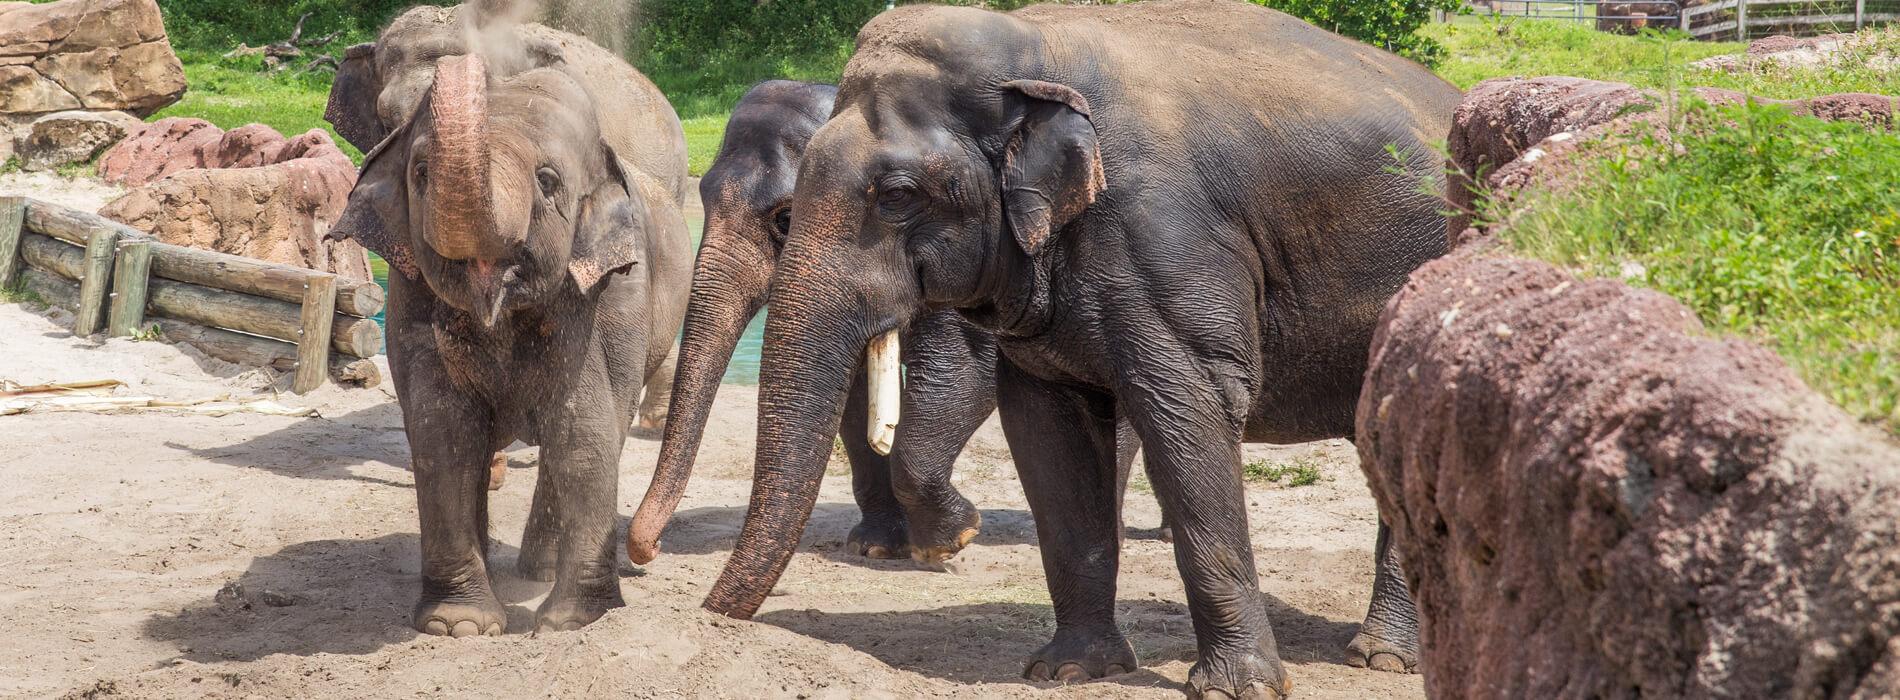 Asian Elephants at Busch Gardens Tampa Bay